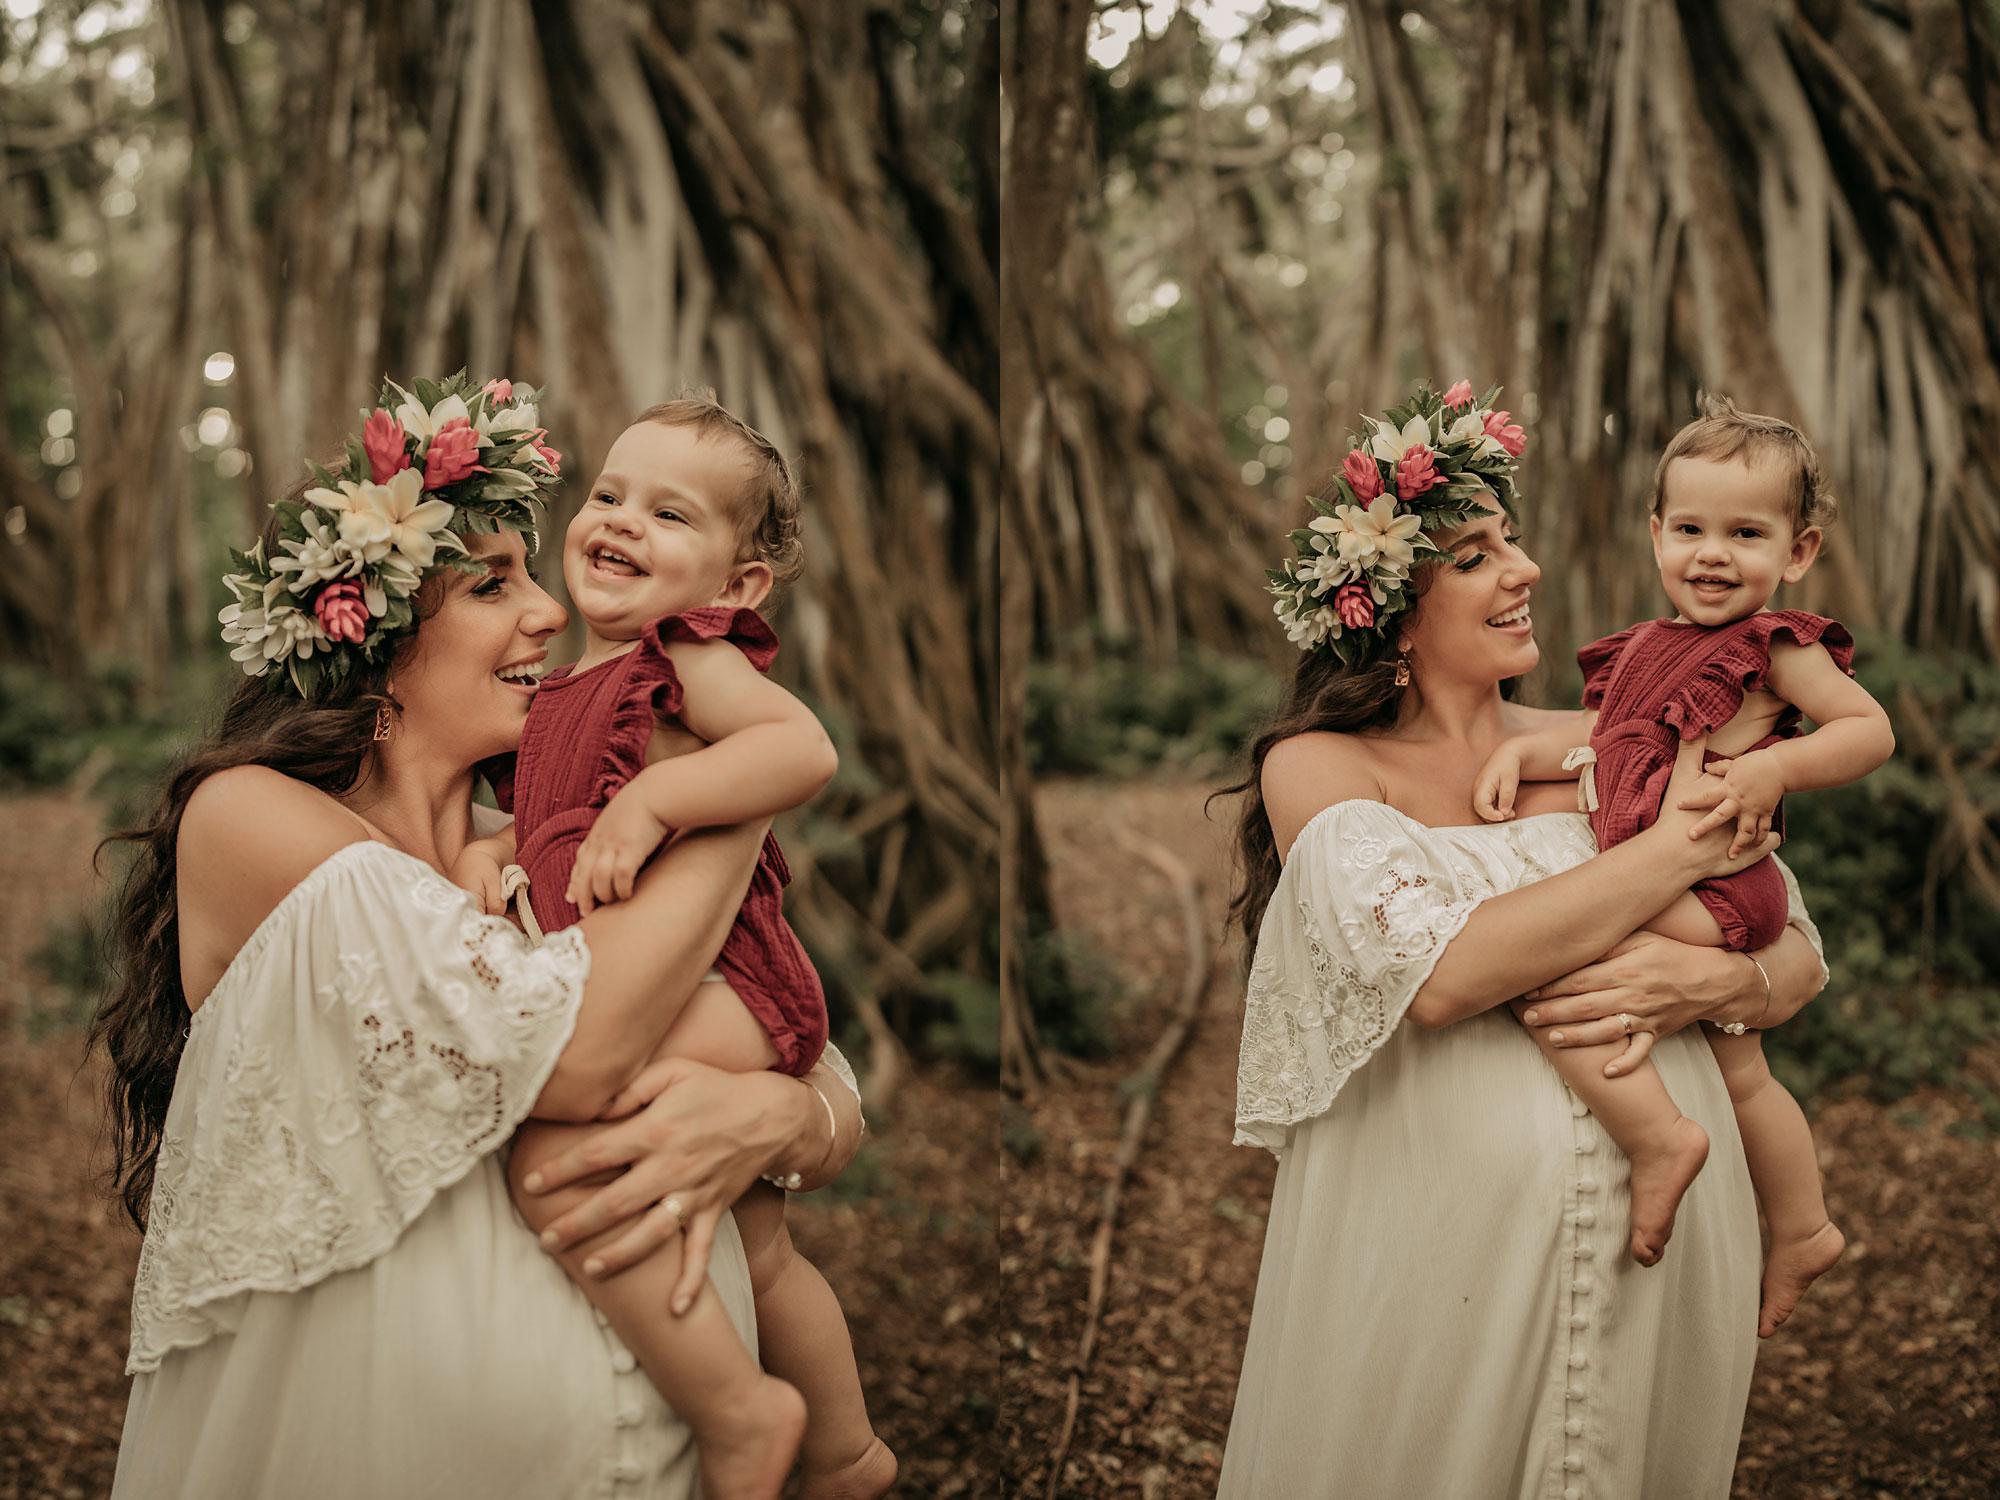 Hawaii-Oahu-Maternity-Photography-The-Sophia-Co-003.jpg